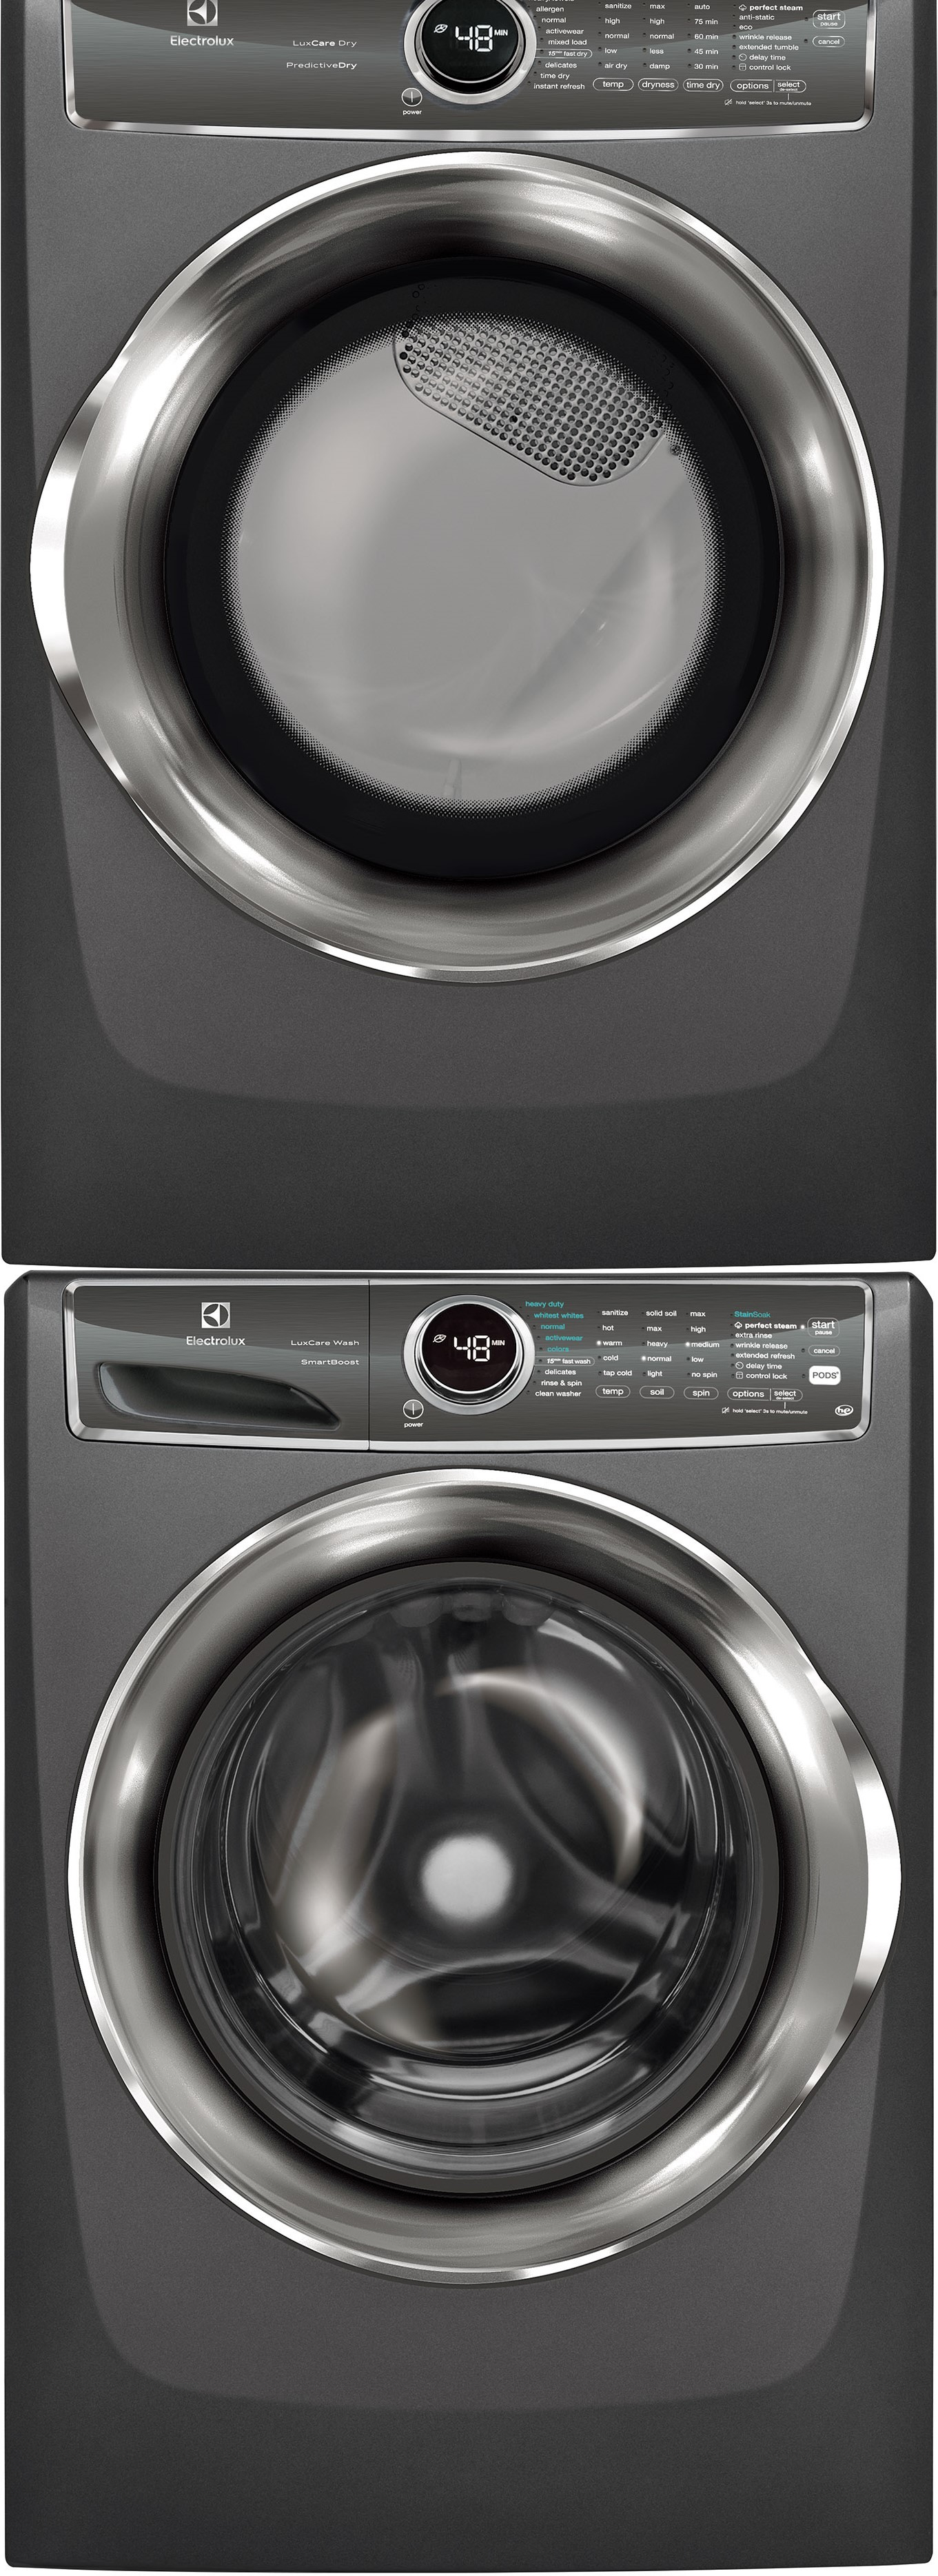 w drawer jsp prod laundry details electrolux off d product pedestal white